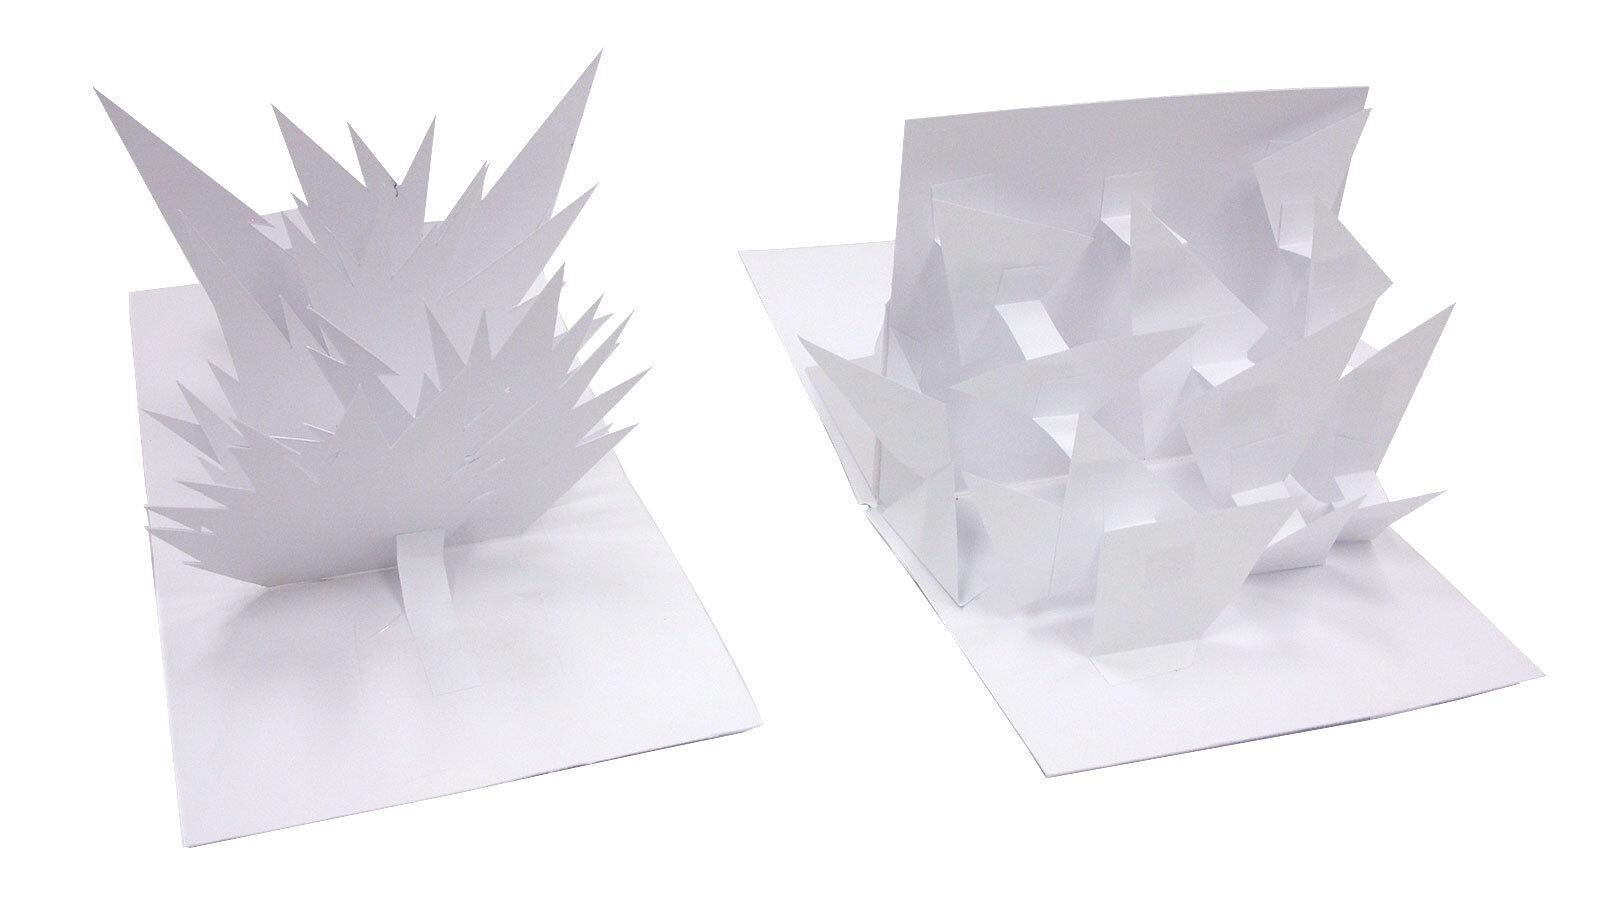 Barneys-New-York-Lady-Gaga-Design-Packaging-2.JPG